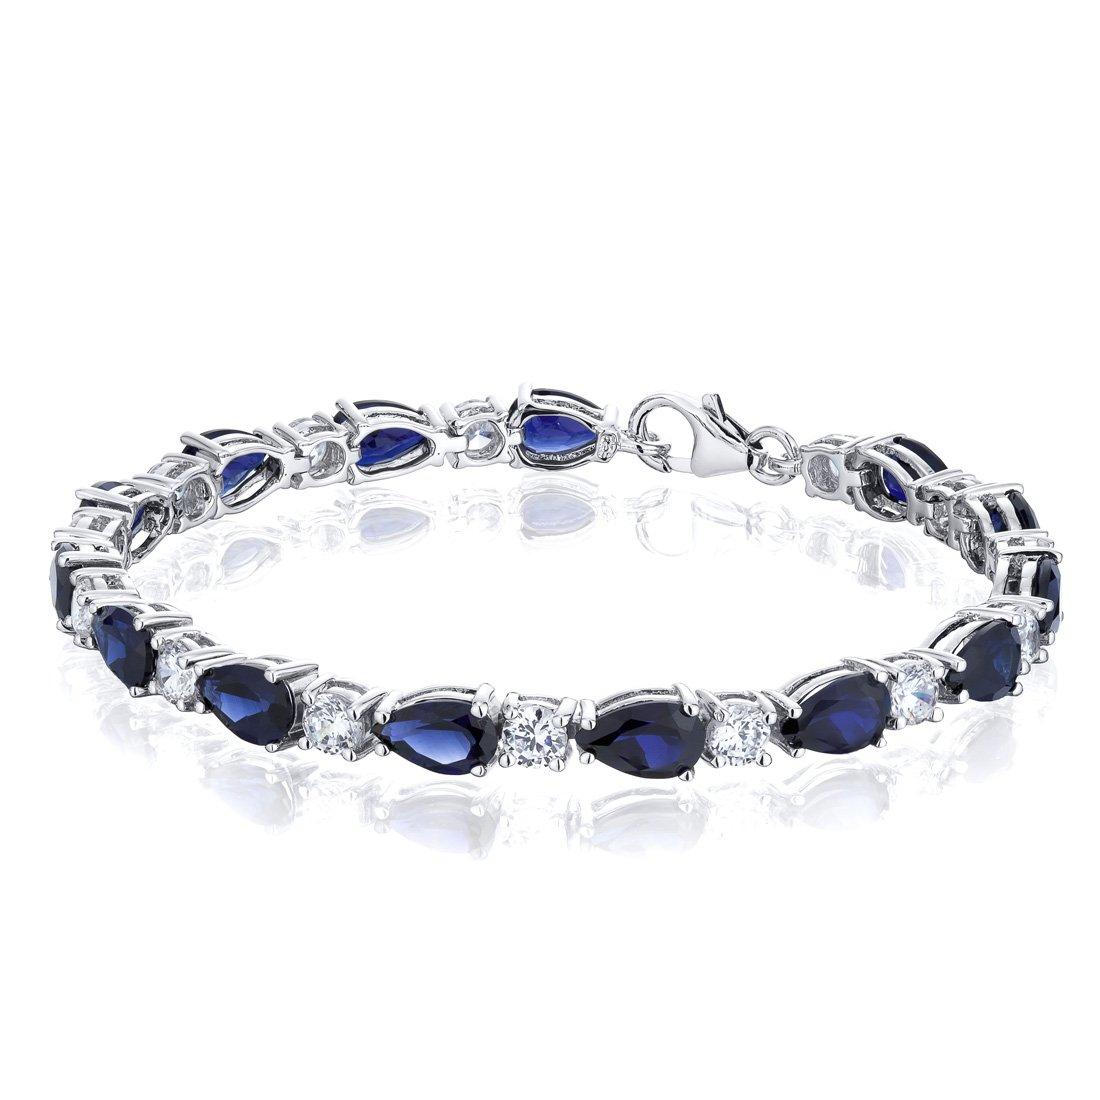 Created Sapphire Bracelet Sterling Silver Rhodium Nickel Finish Tear Drop 13.00 Carats